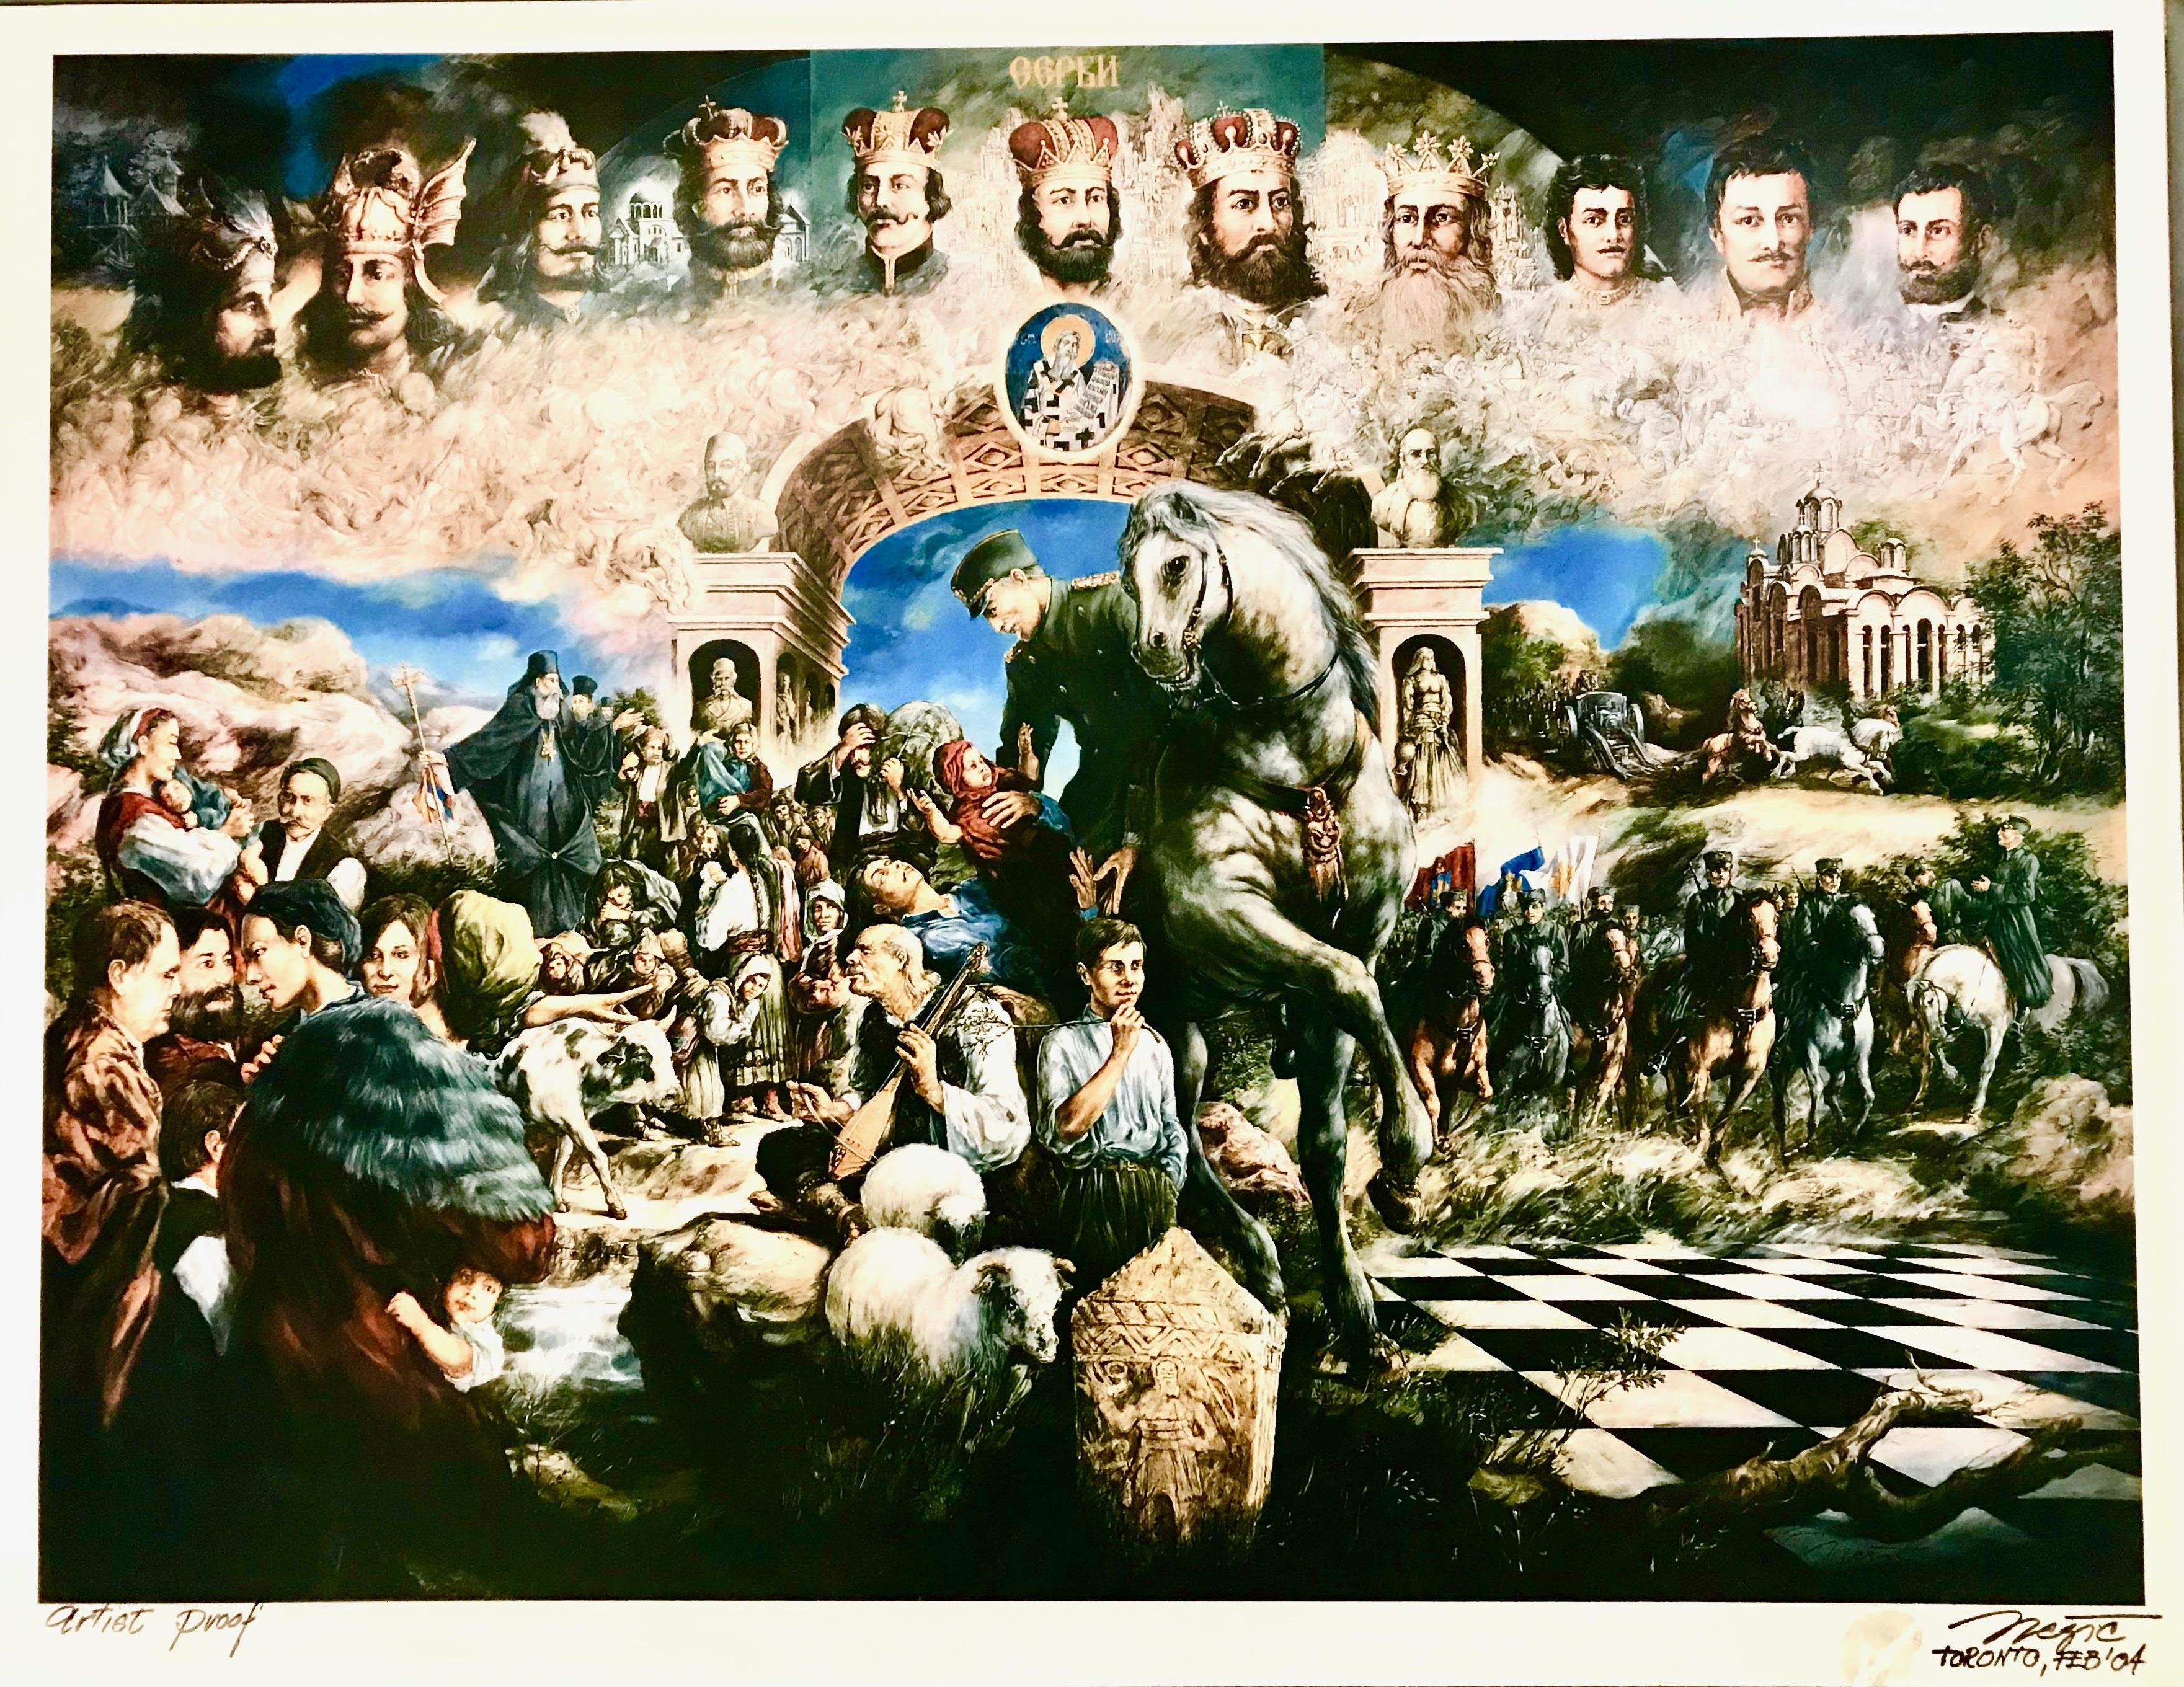 Miroslav Nešić - Limited edition poster  90cm x 70cm ($40)